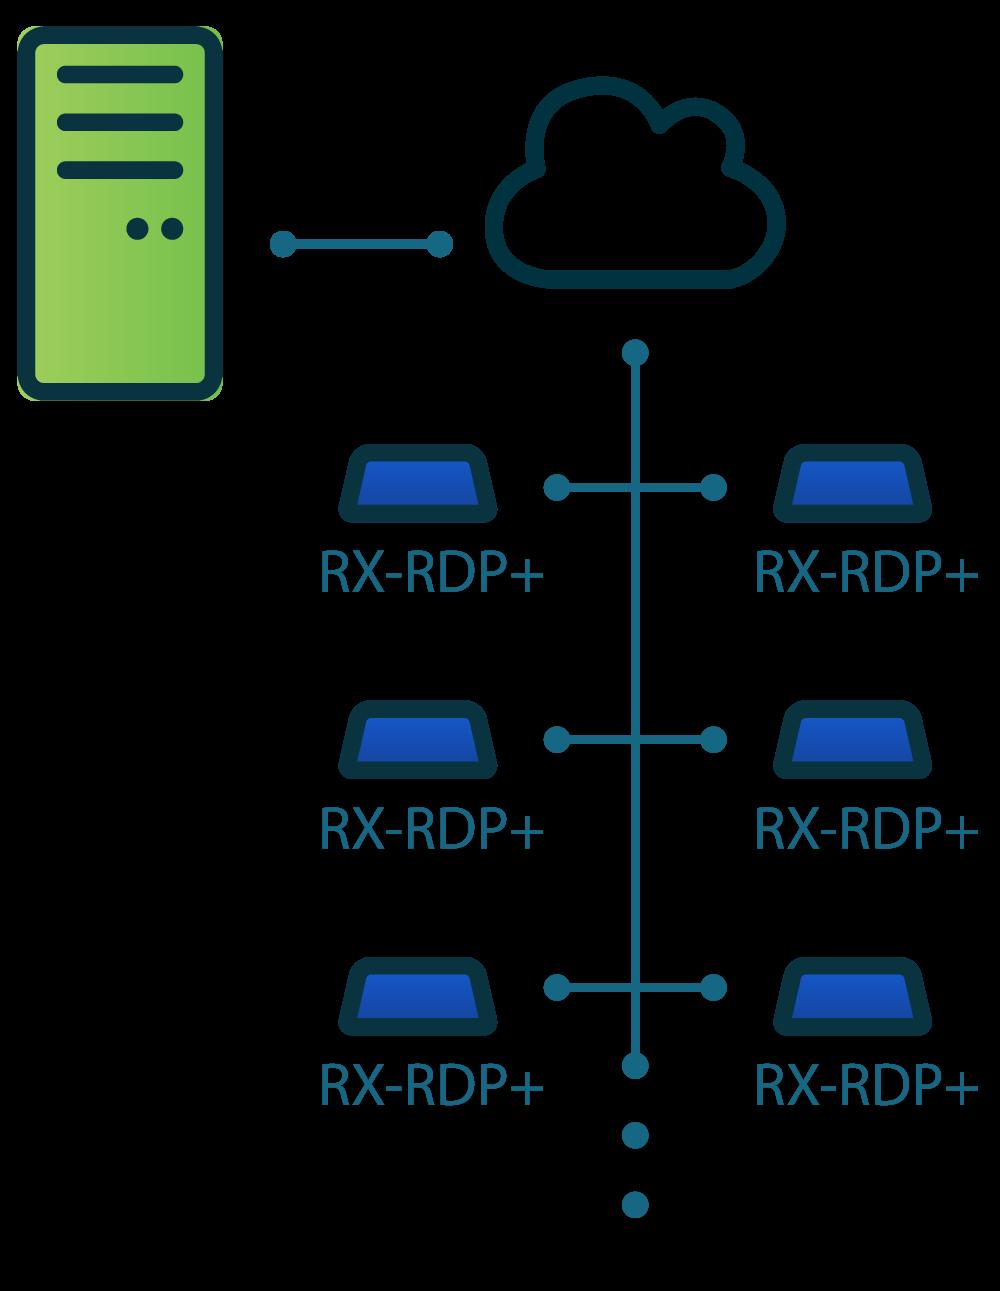 NComputing使用PMC 设备管理软件可以轻松配置RX-RDP/RX-RDP+瘦客户端